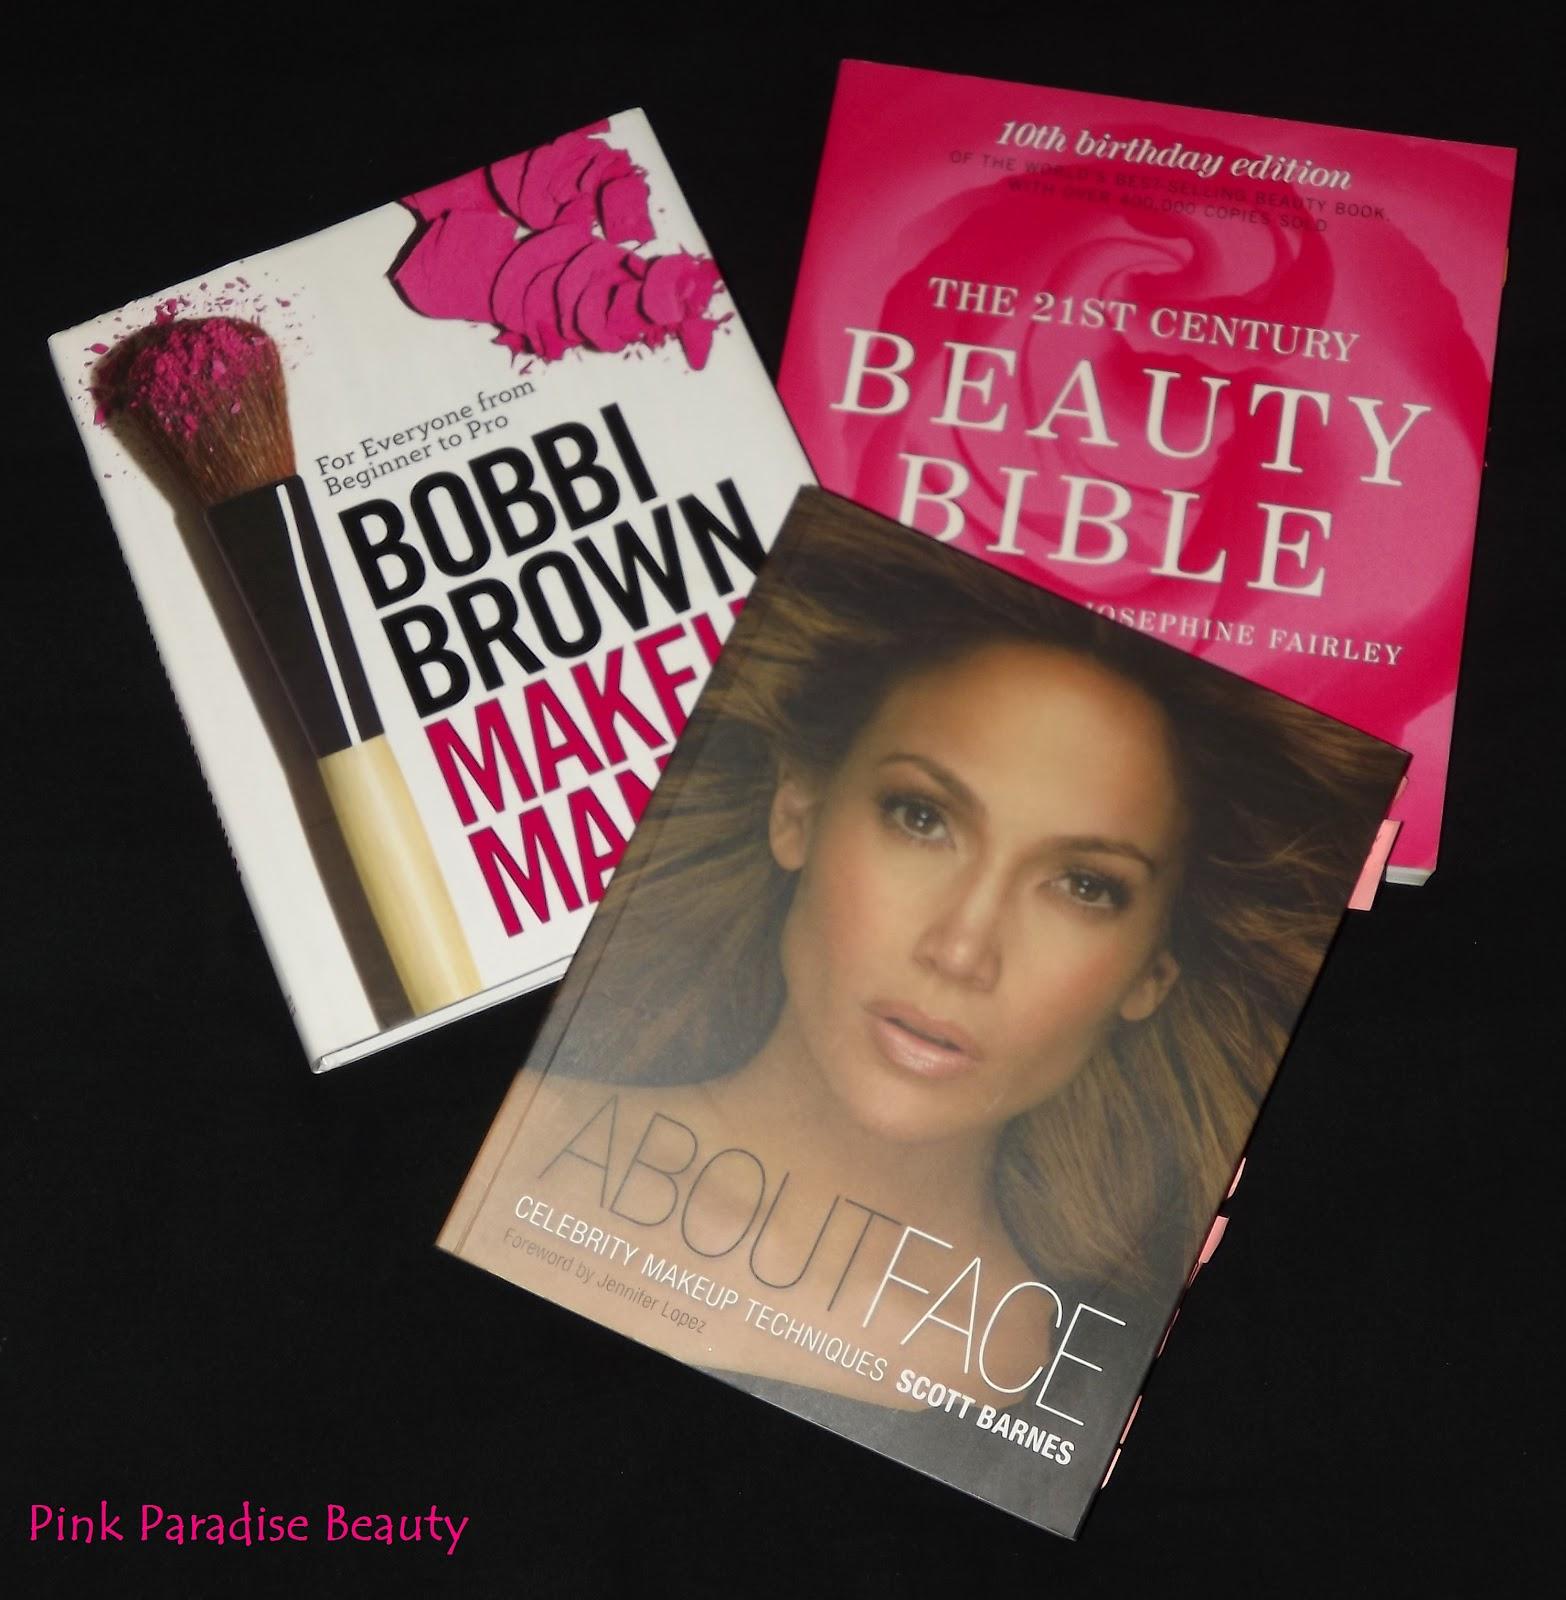 My Top 3 Beauty Books - Bobbi Brown, Scott Barnes, Beauty